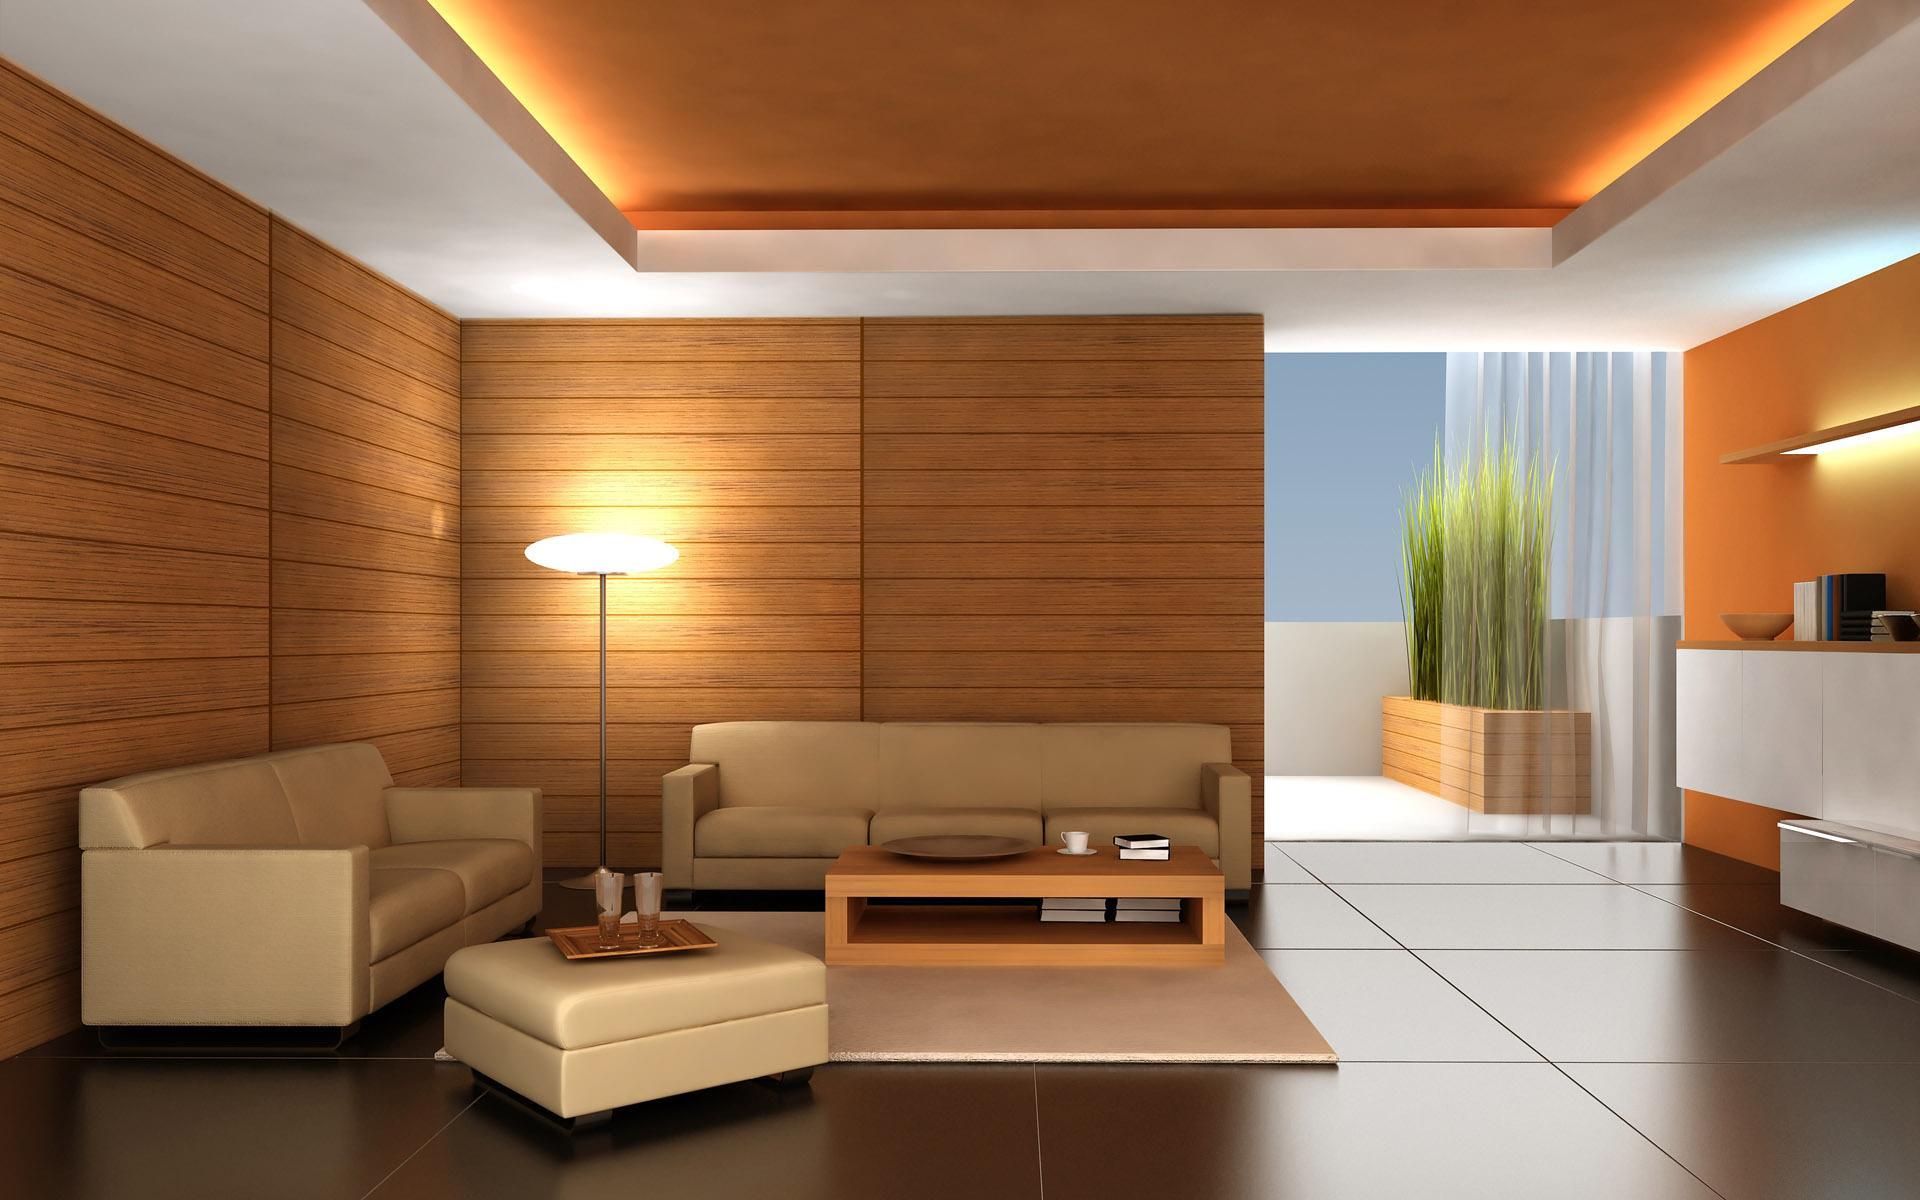 Lighting Ideas   Decorative Lighting for Home   Living Room ...